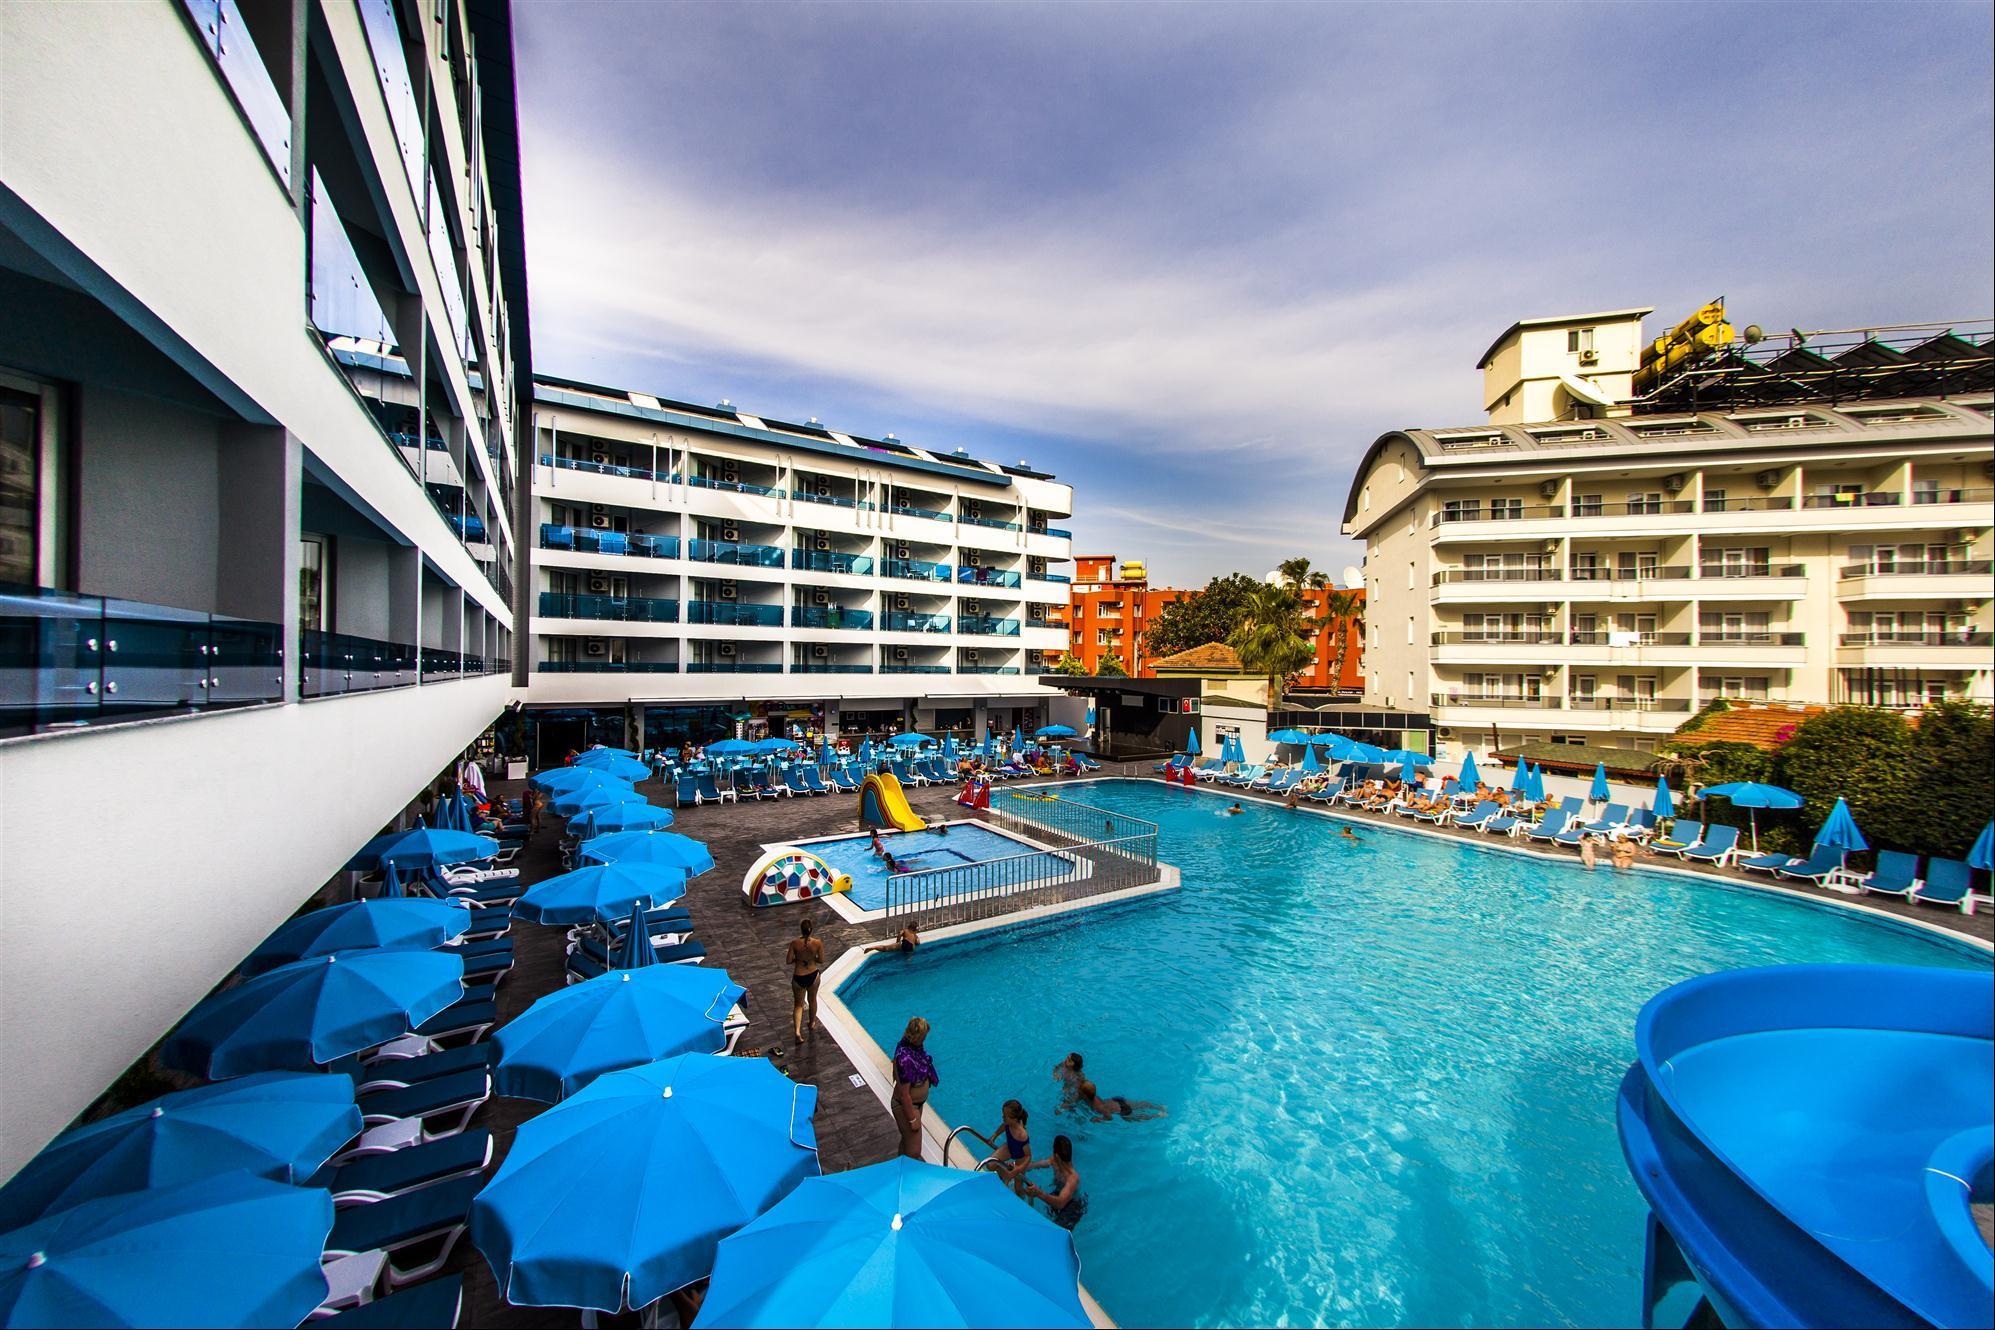 avena-resort-spa-hotel-ex-gold-safran-hotel-genel-0019